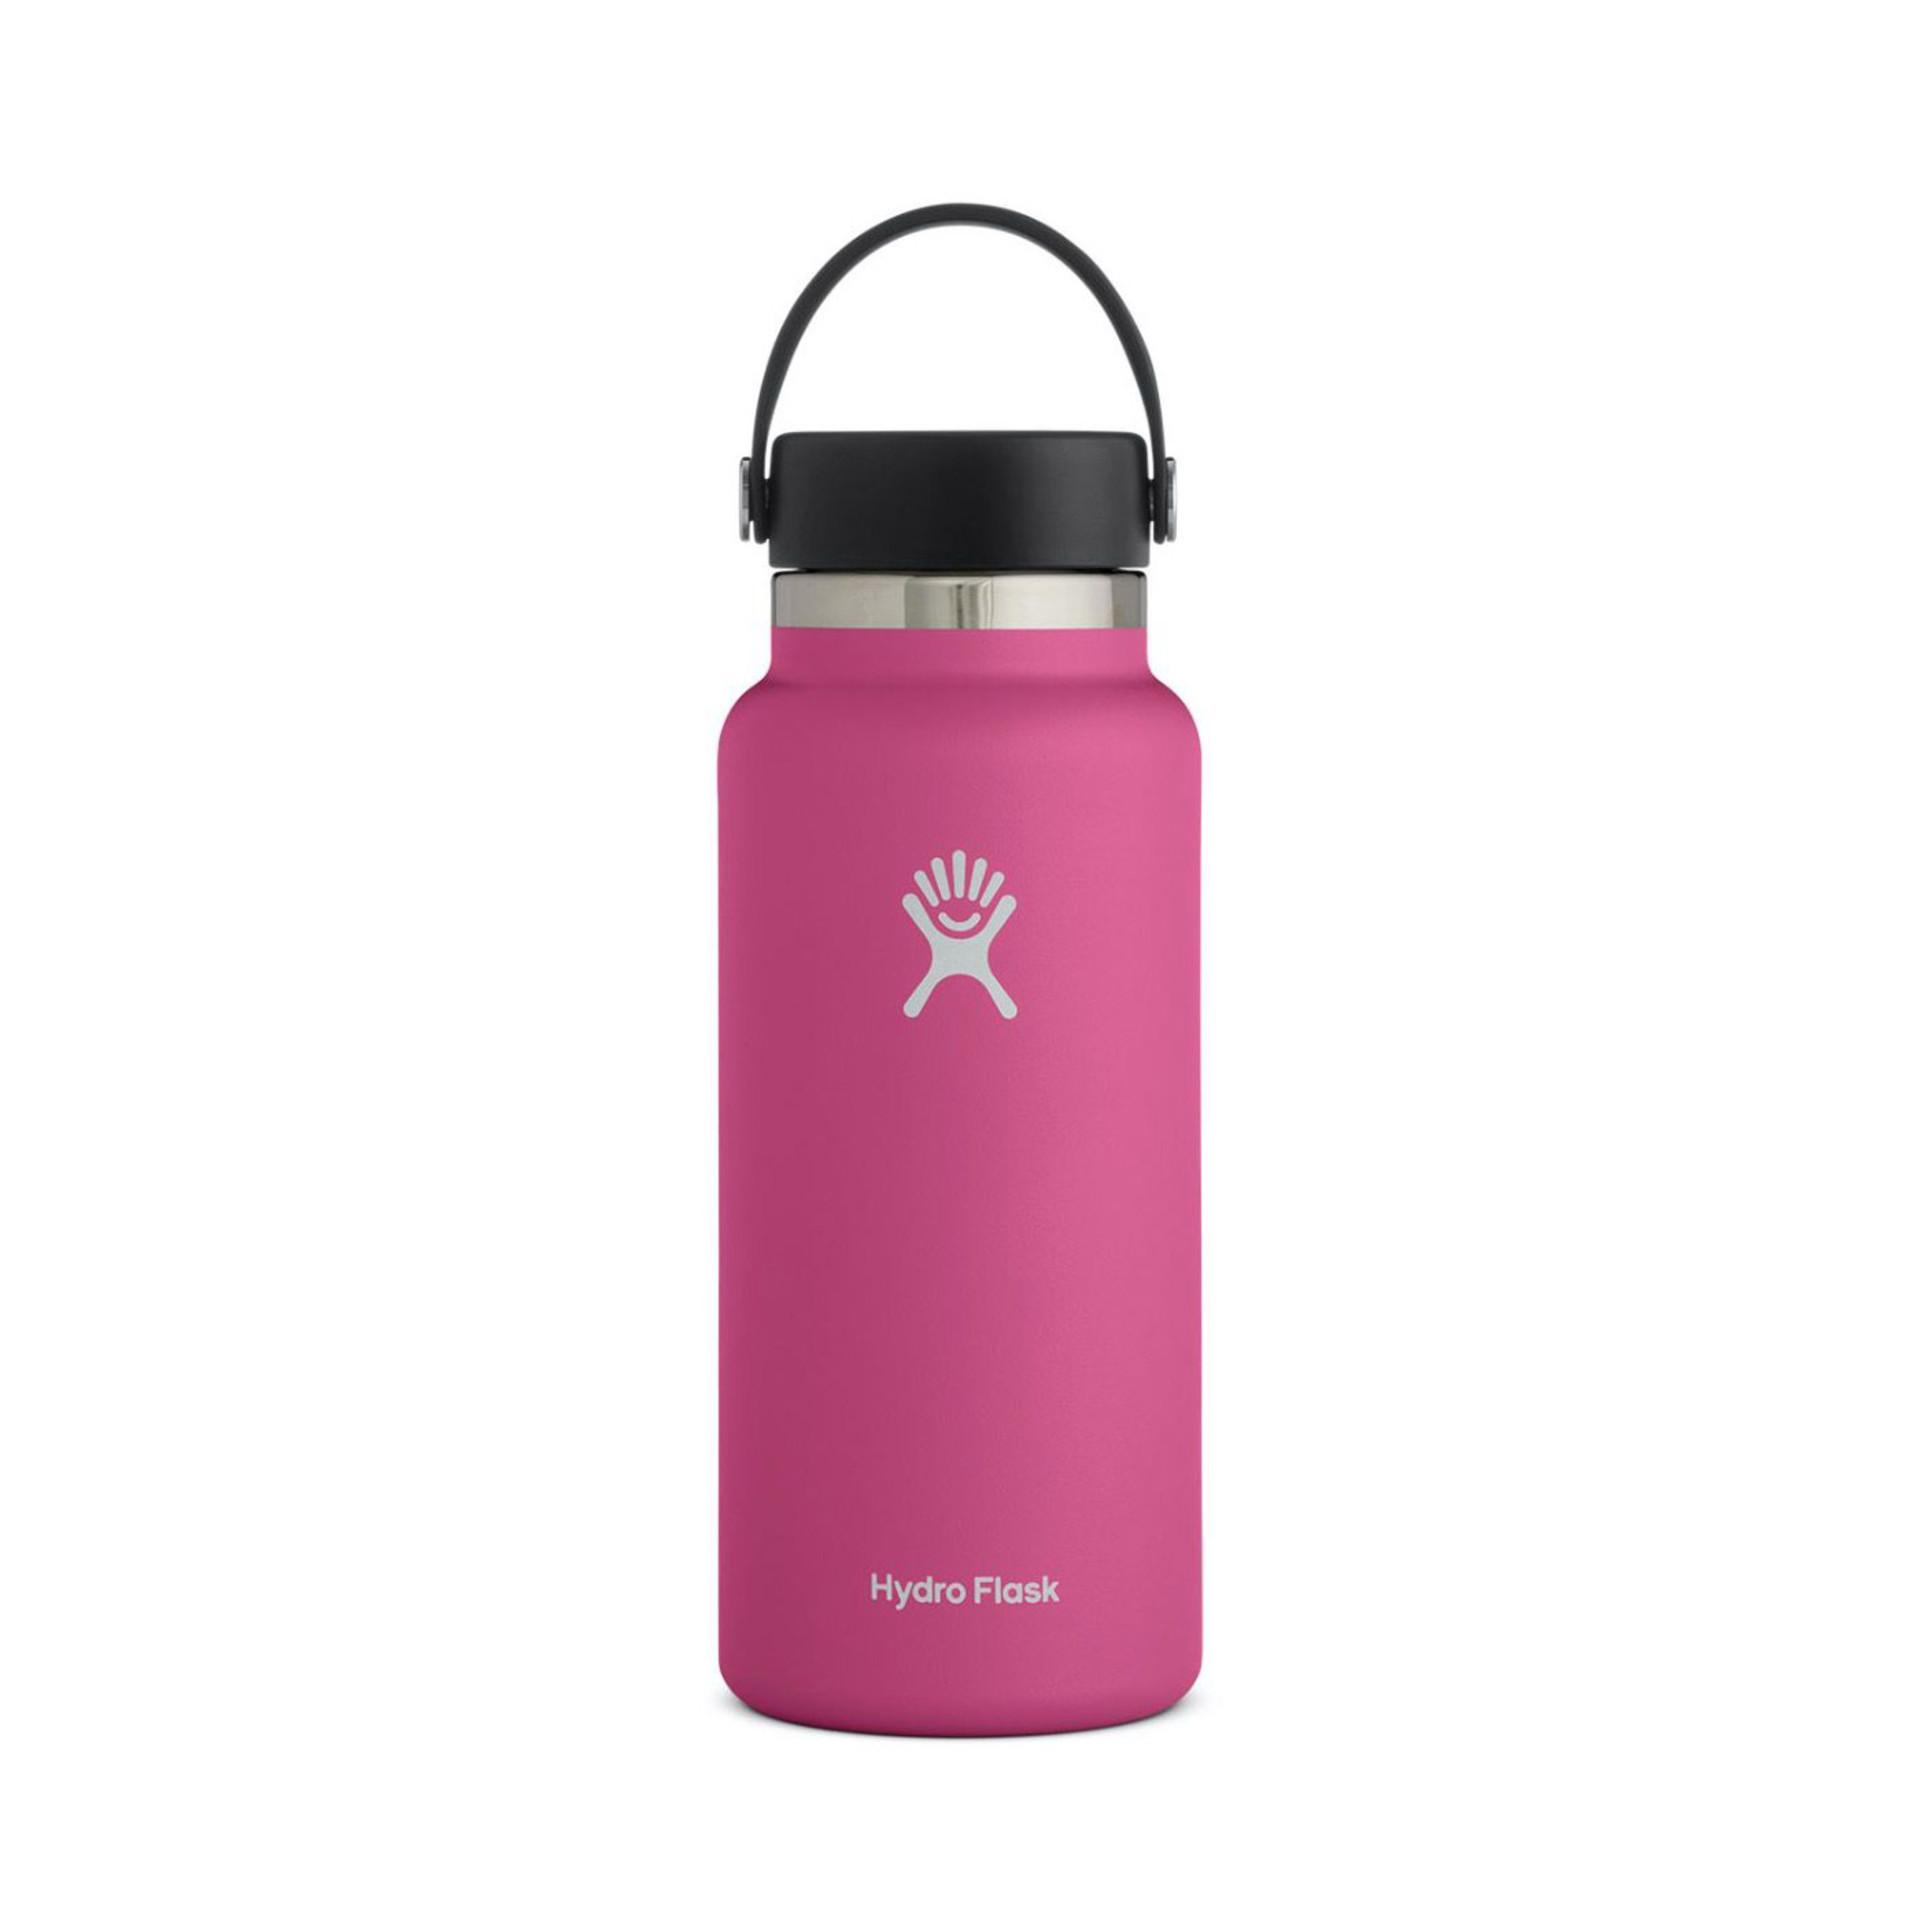 Hydro Flask Wide Mouth Water Bottle 32oz – Carnation